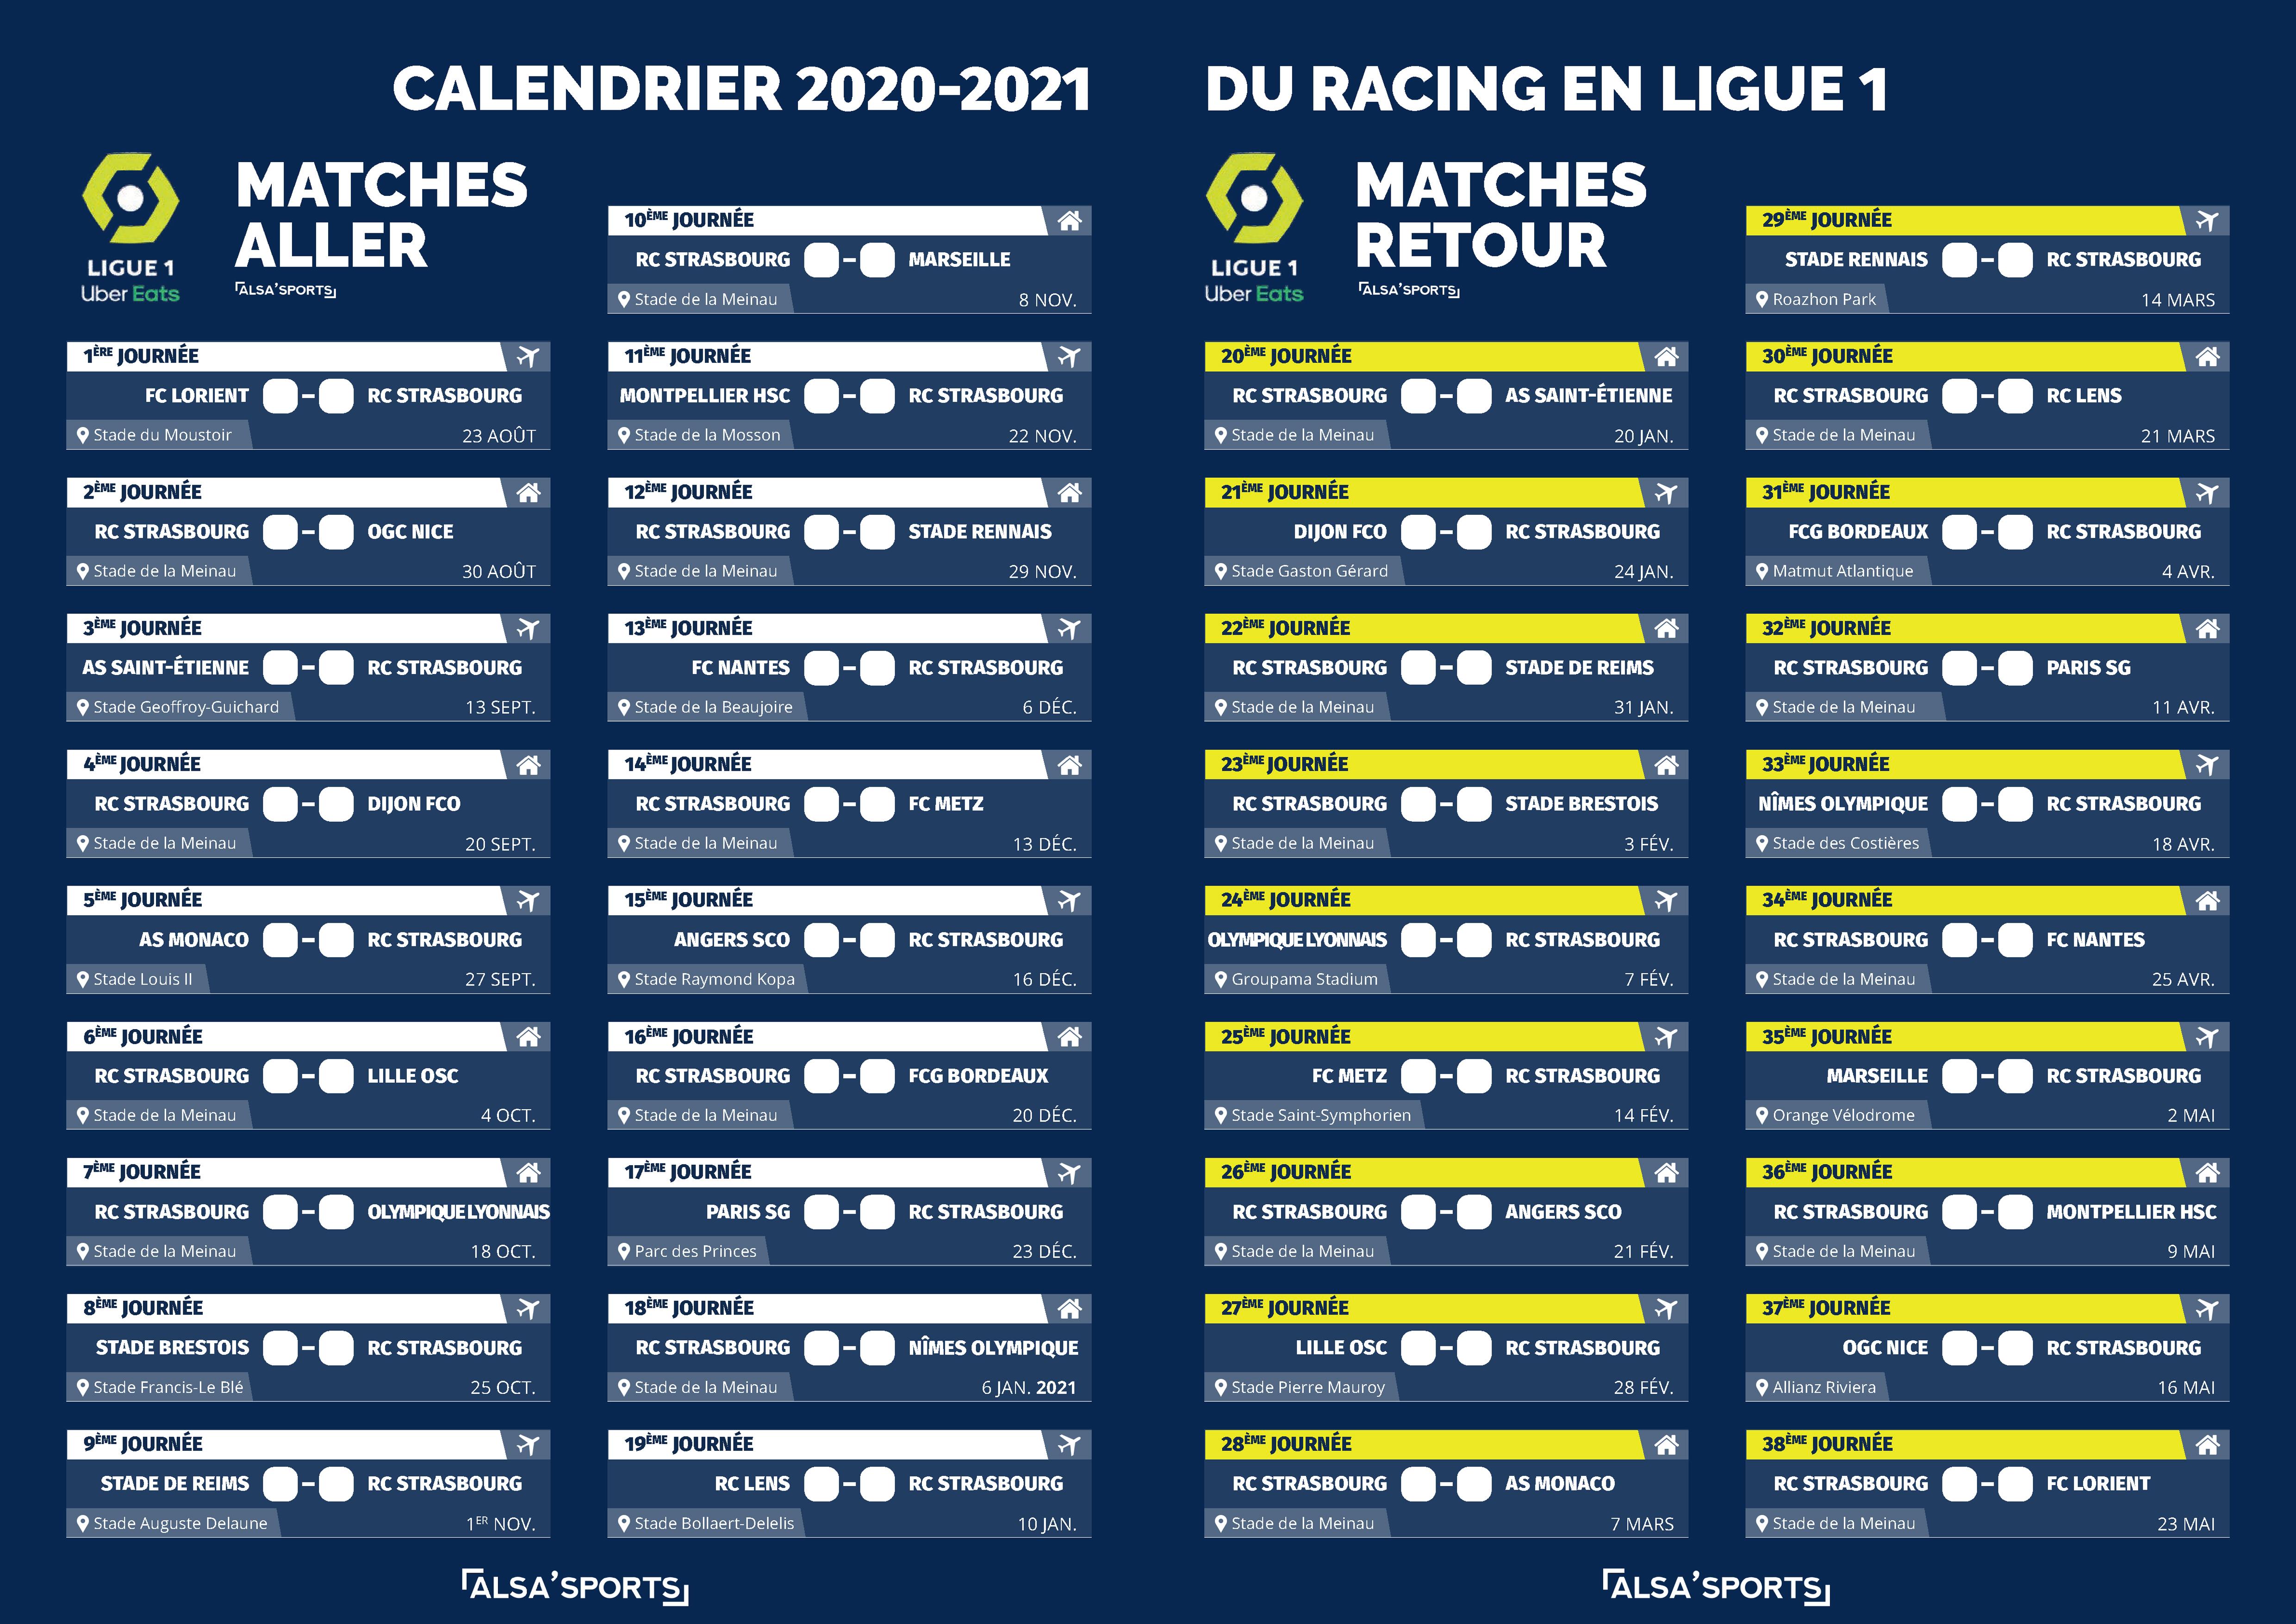 Calendrier Ligue 1 2021 Pdf Le calendrier du Racing à imprimer ! — Alsa'Sports